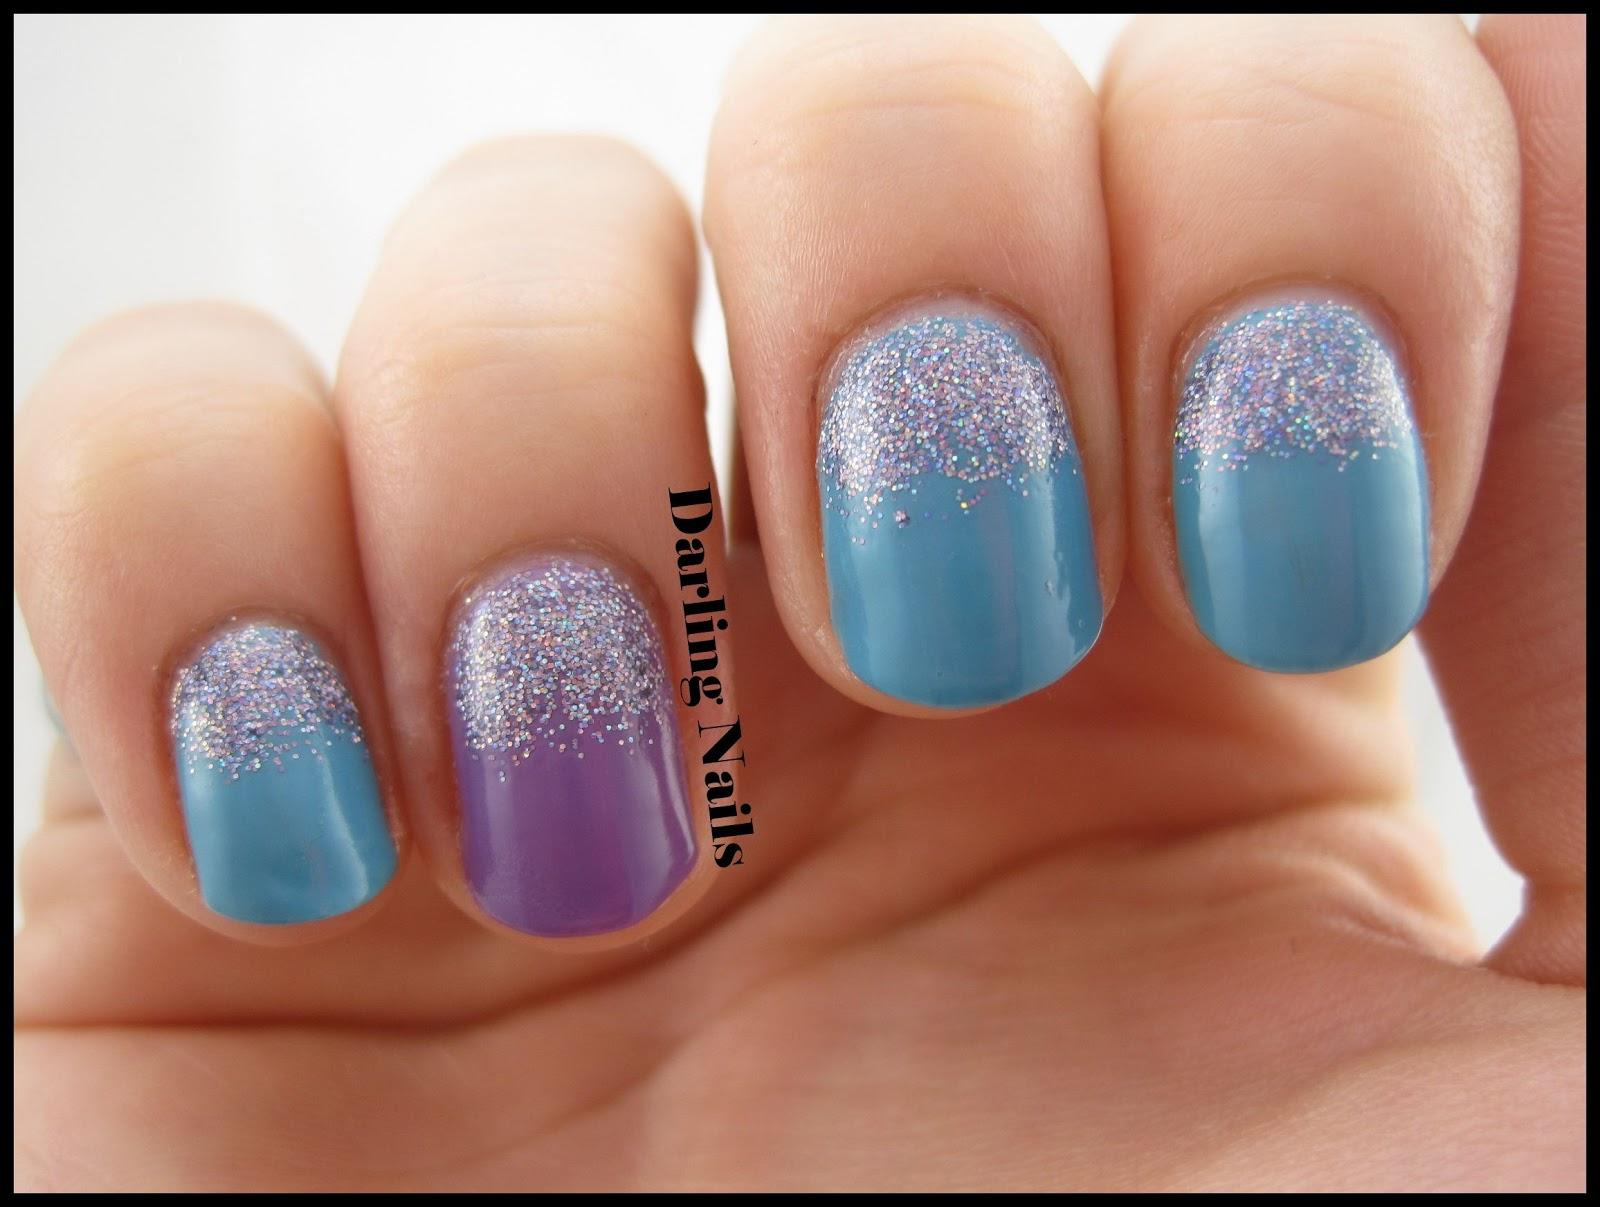 Darling Nails: Glitter Cuticles